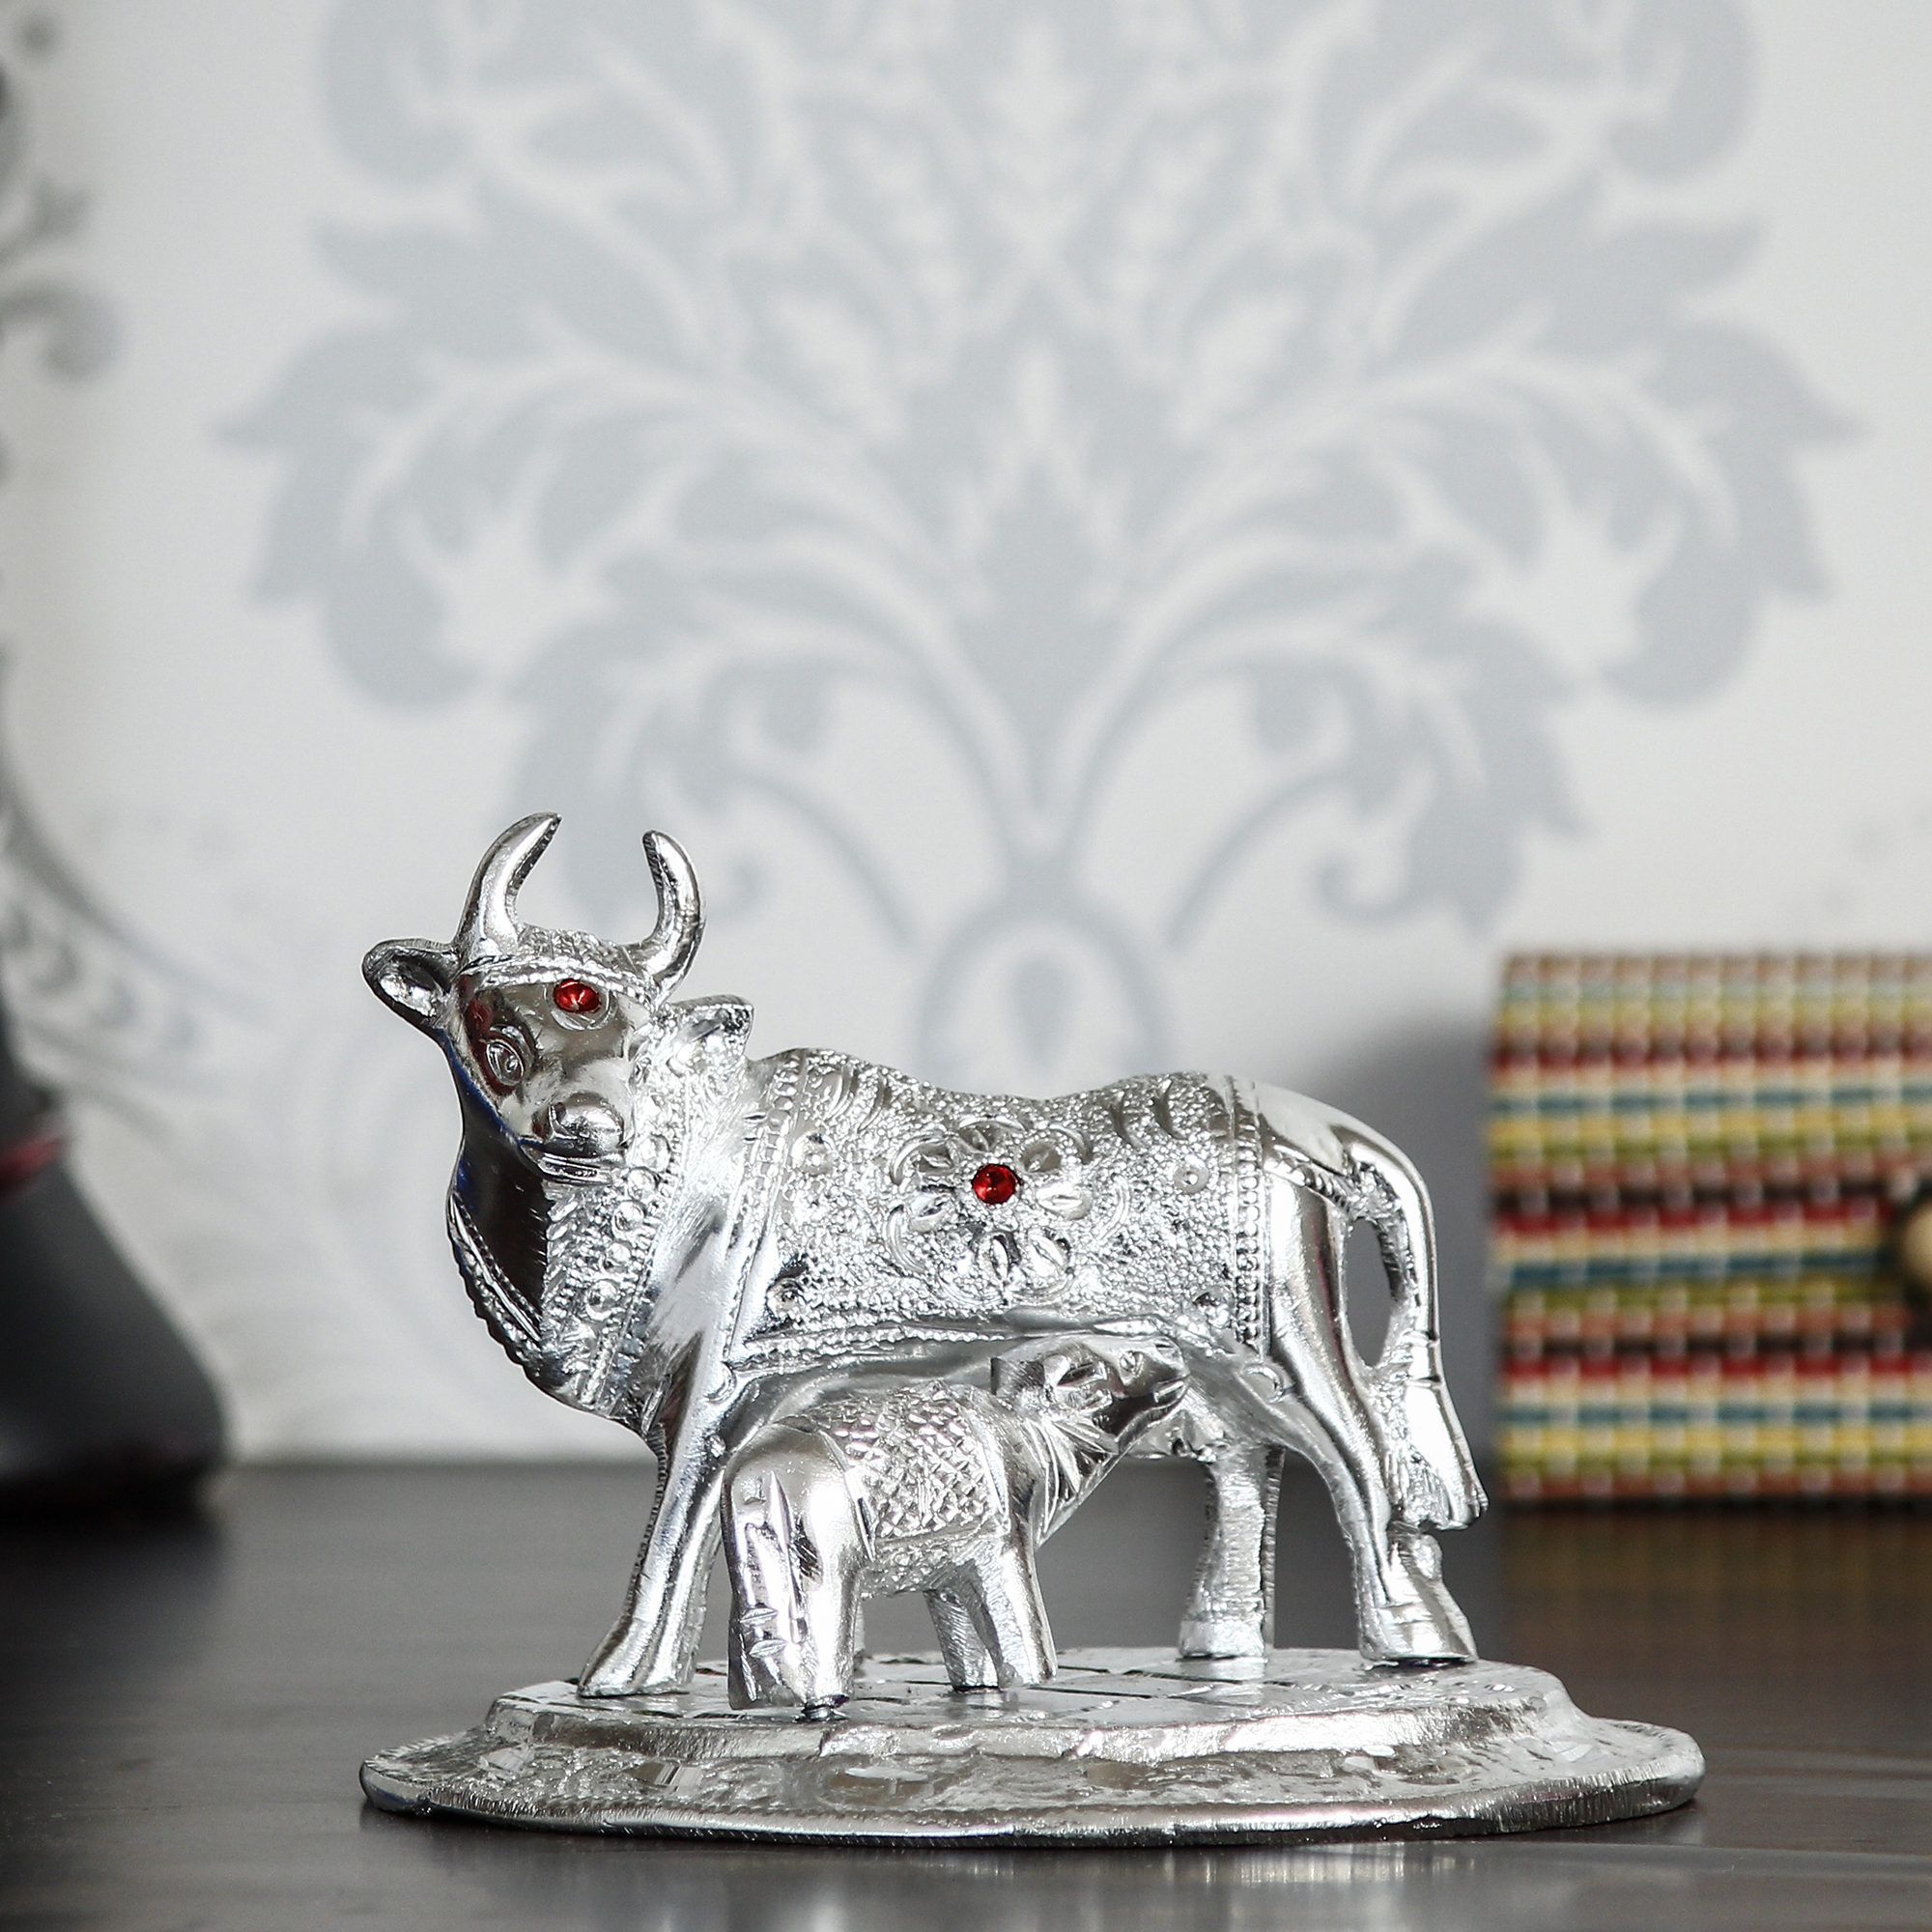 Premium White Metal Decorative Kamdhenu Cow with Calf Figurine Indian Home Decor